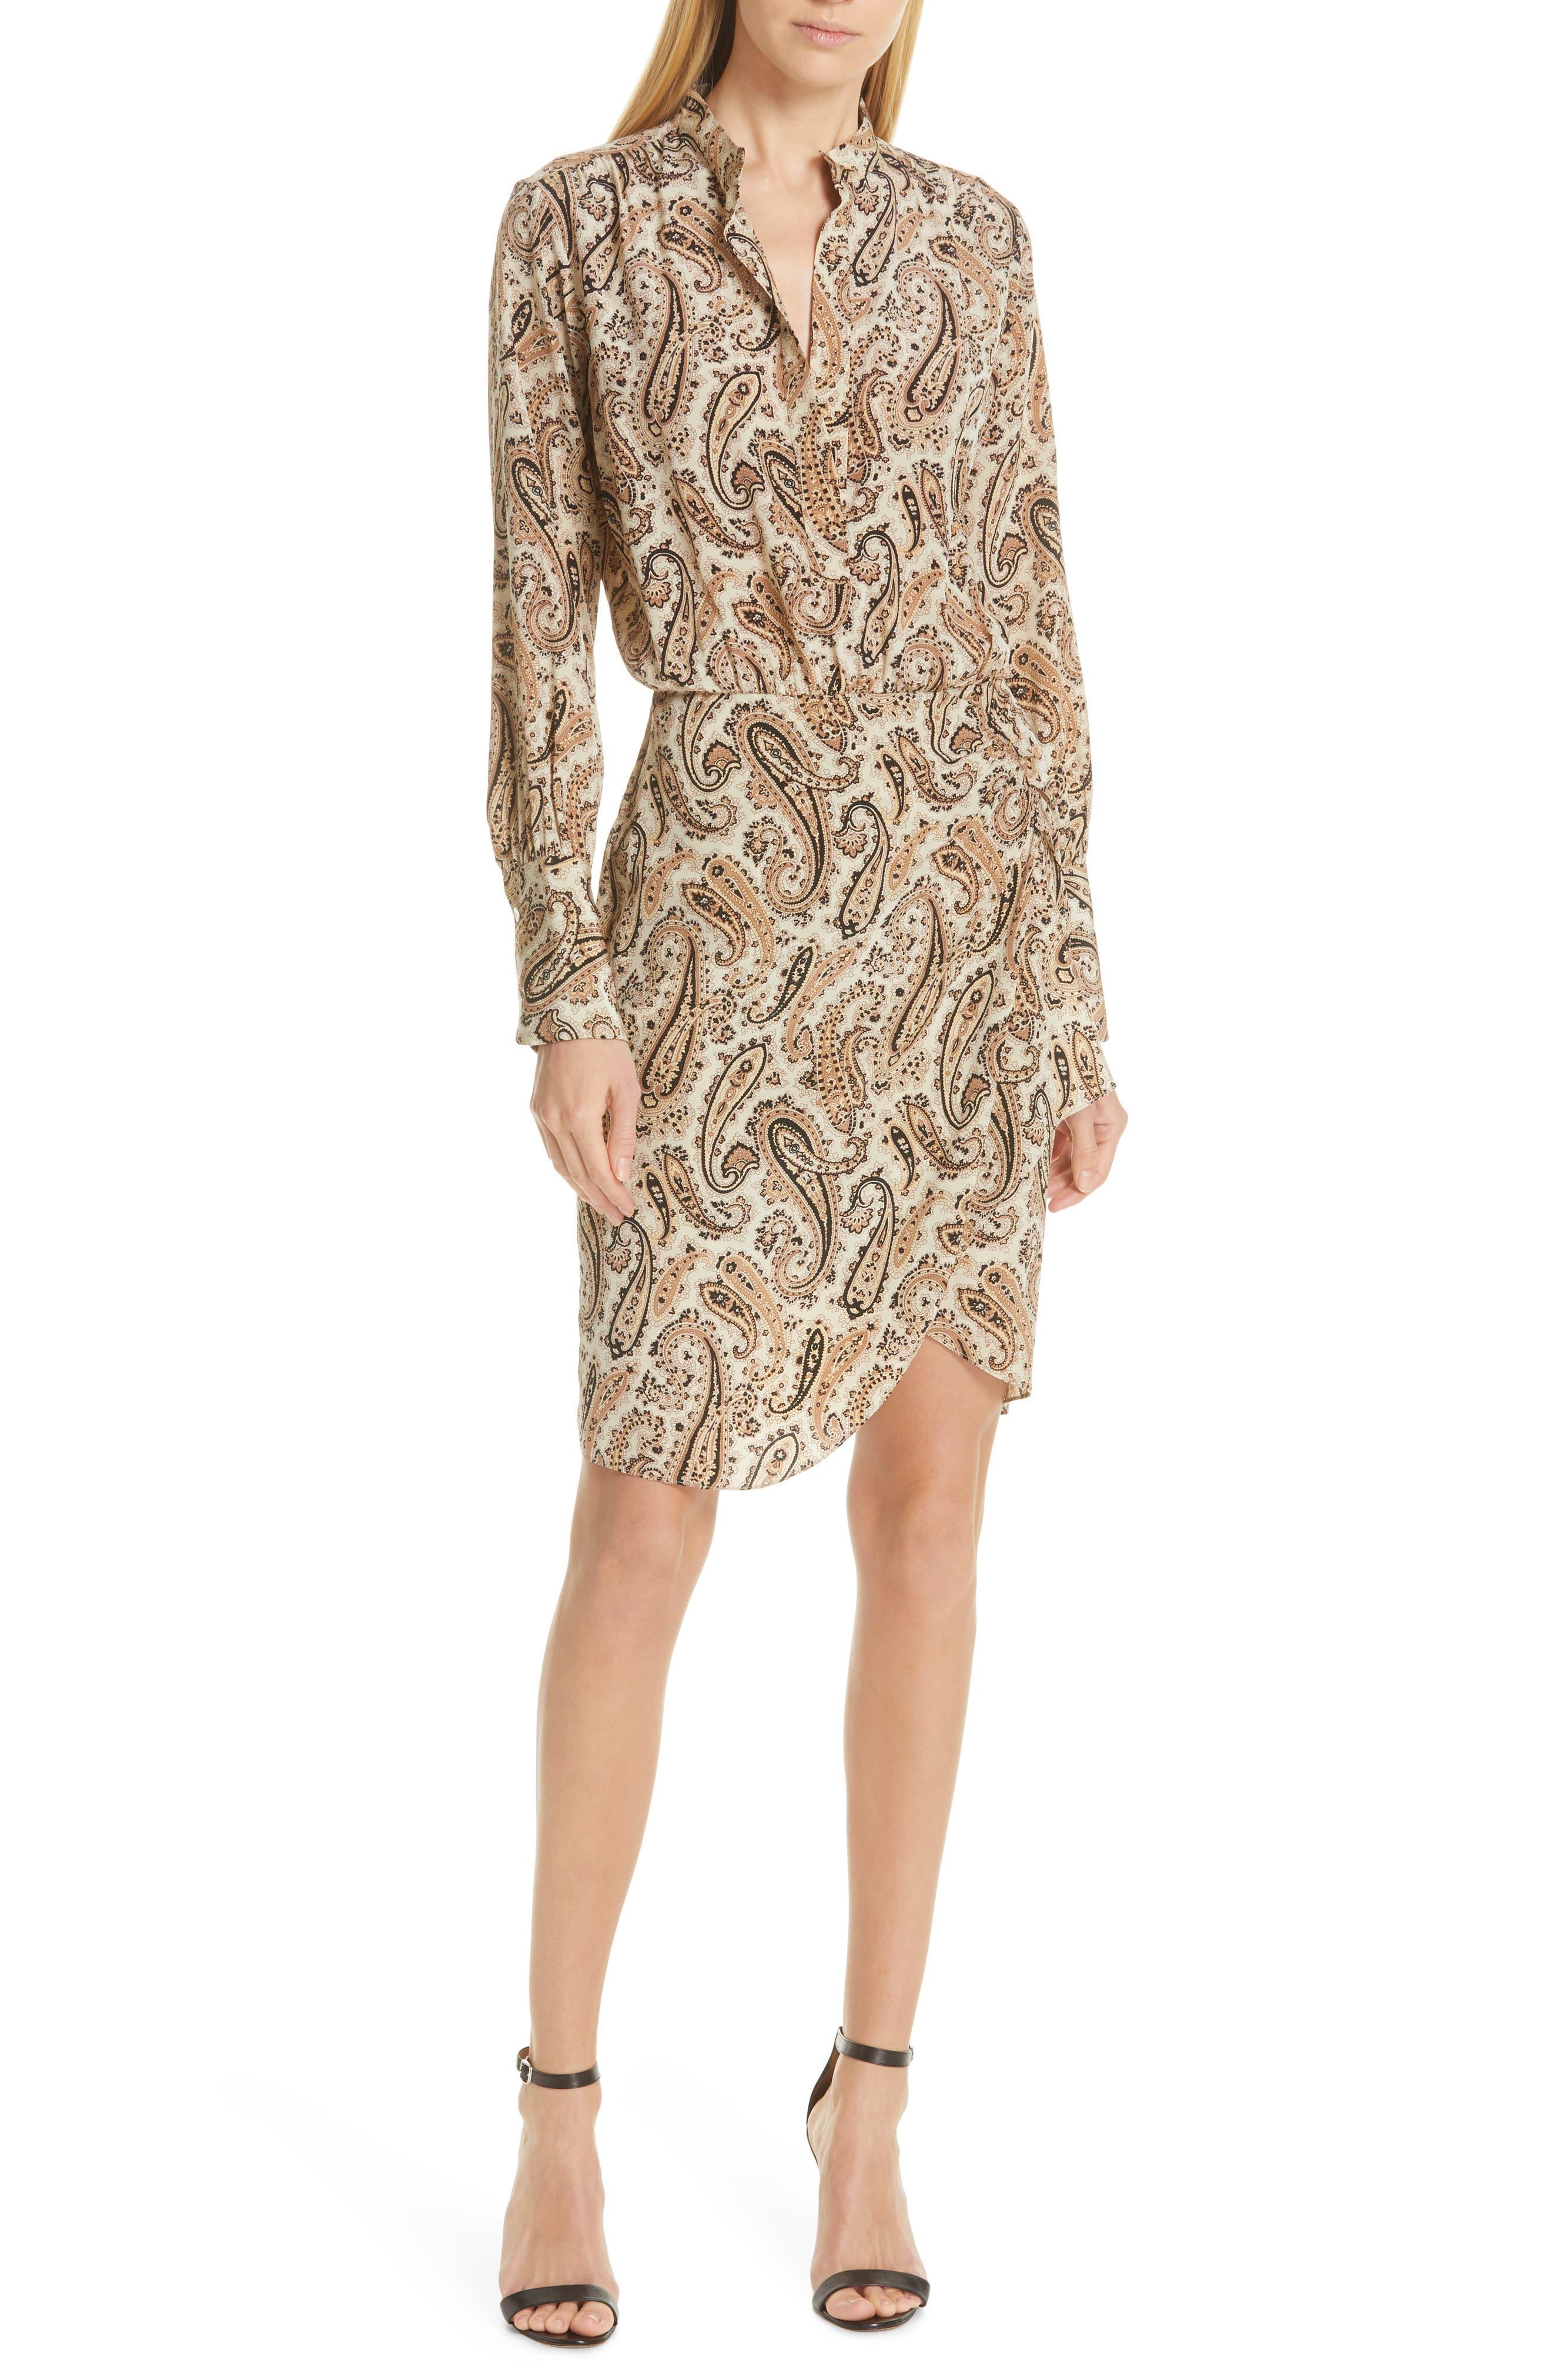 NILI LOTAN Paisley Silk Shirtdress, Main, color, BLACK AND BEIGE PAISLE